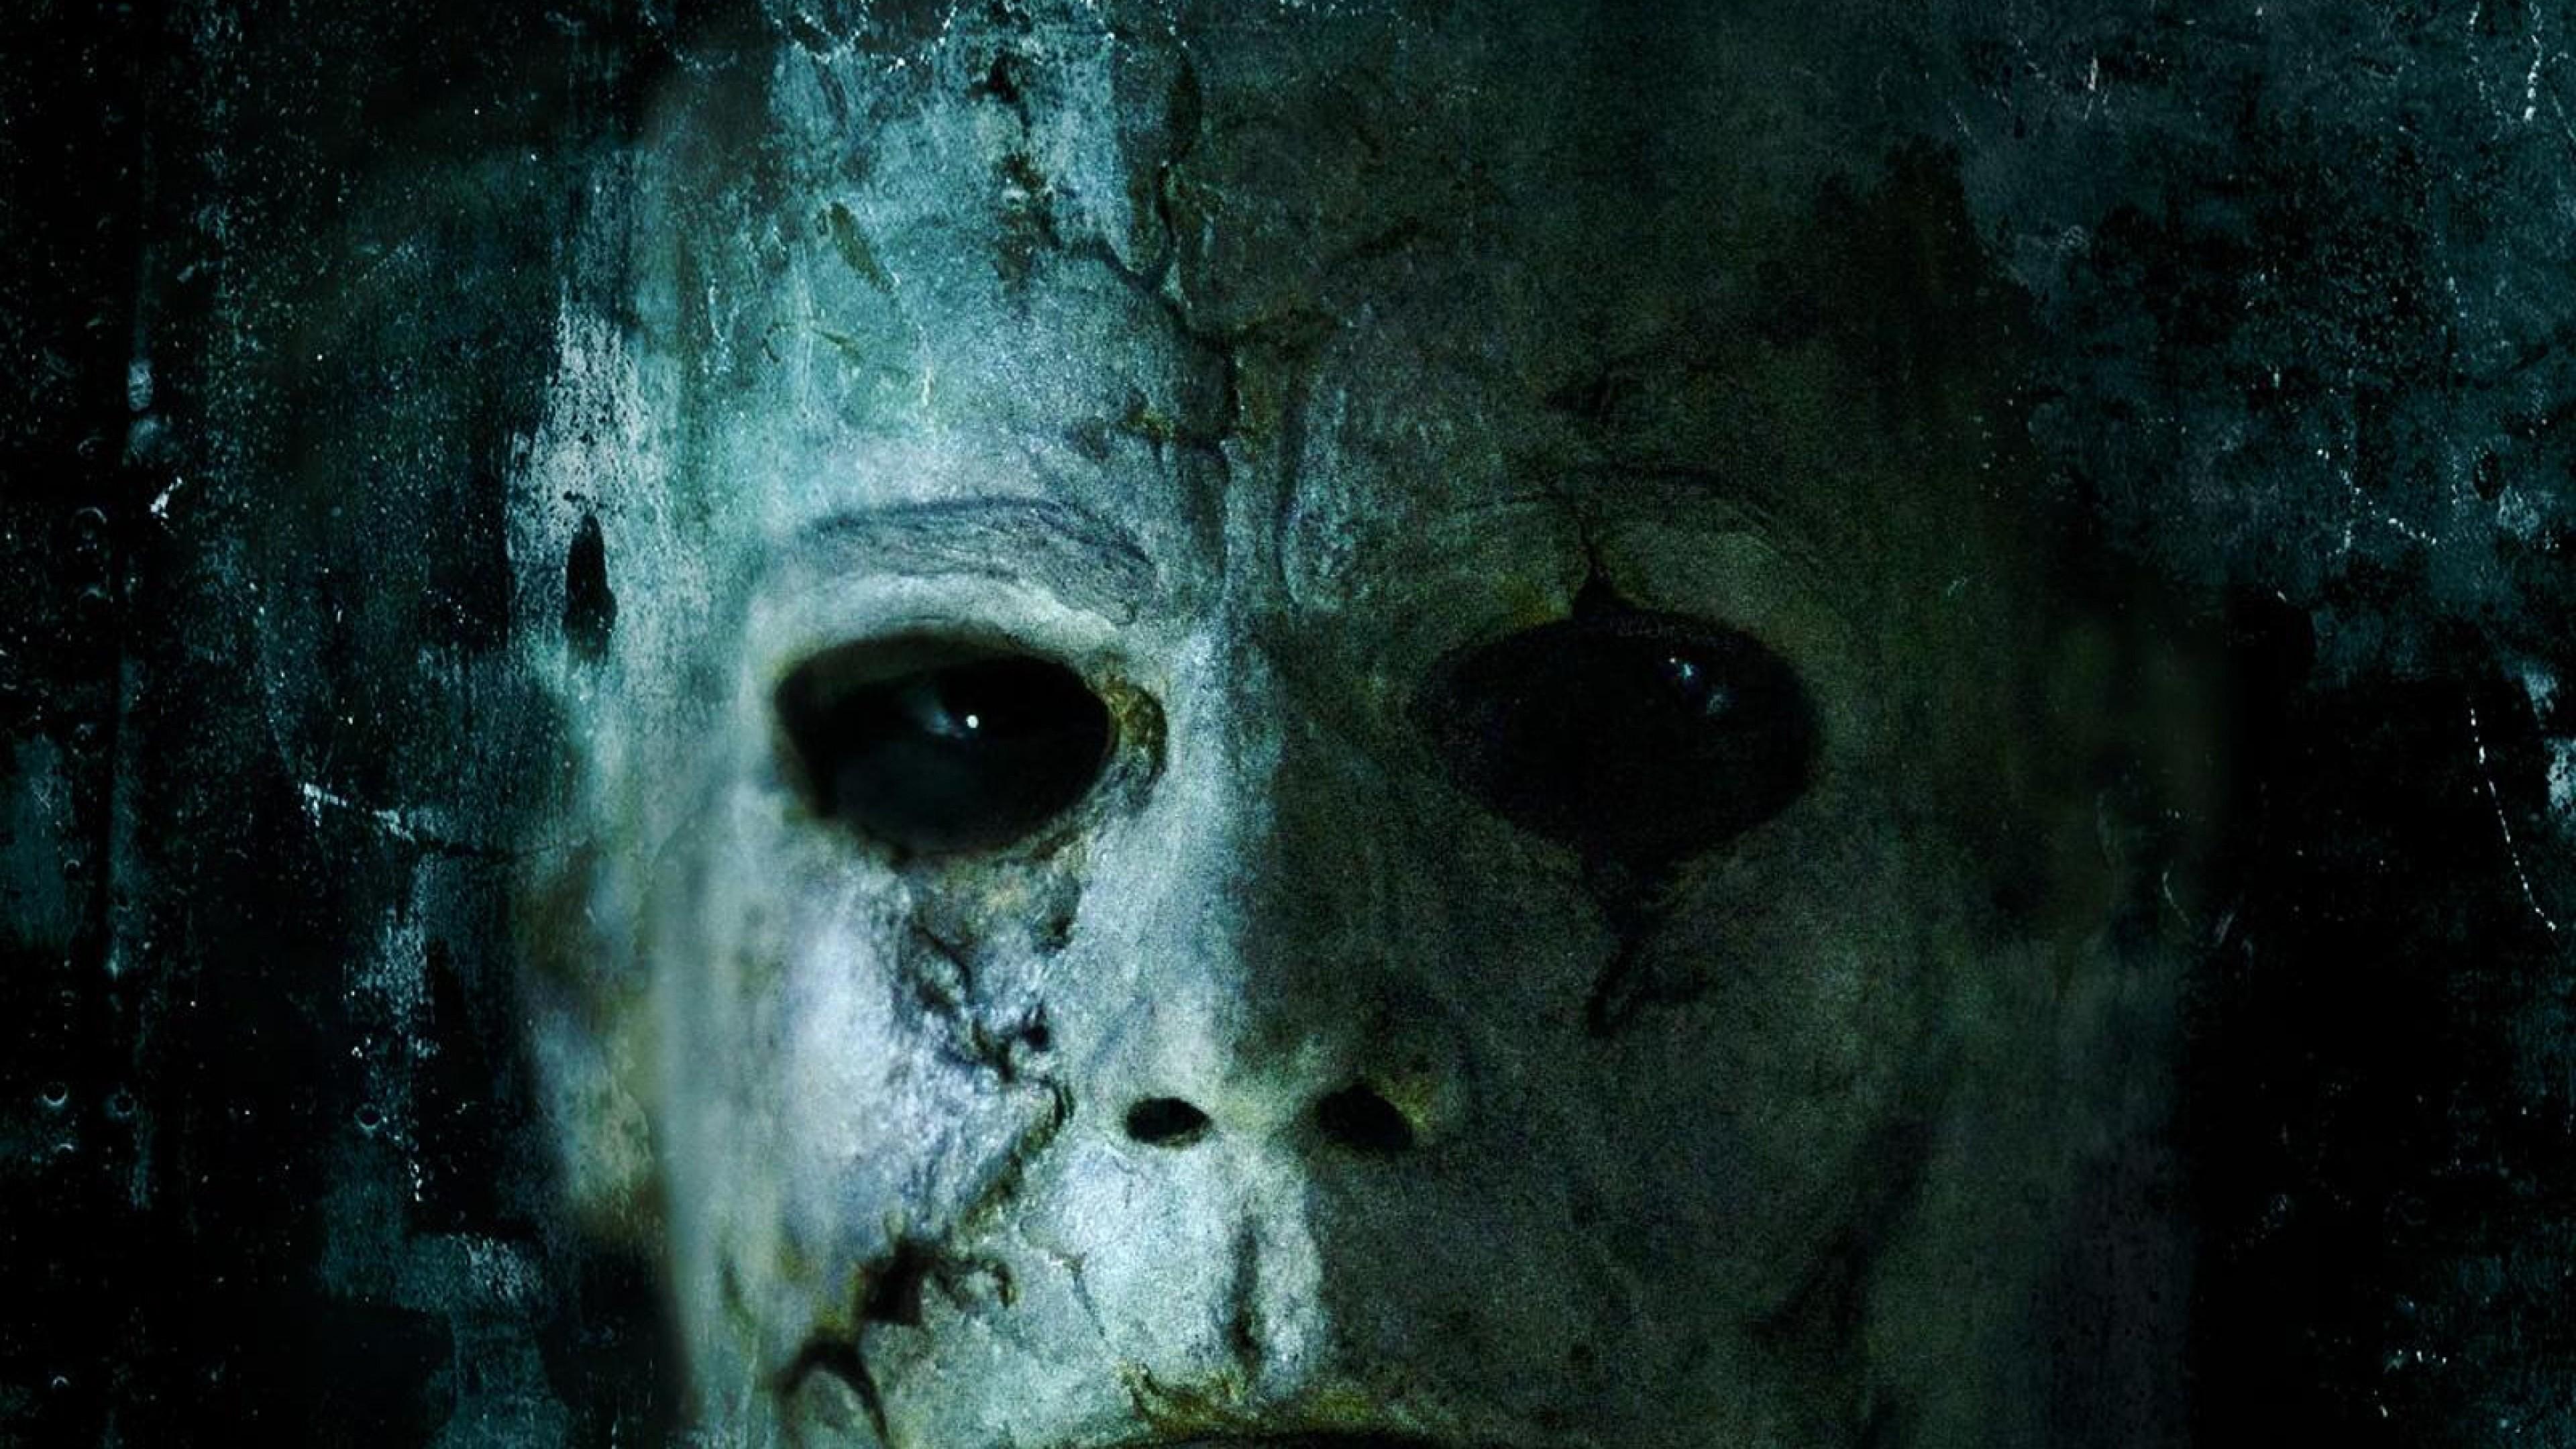 Wallpaper halloween 2, michael myers, face, mask, killer, maniac,